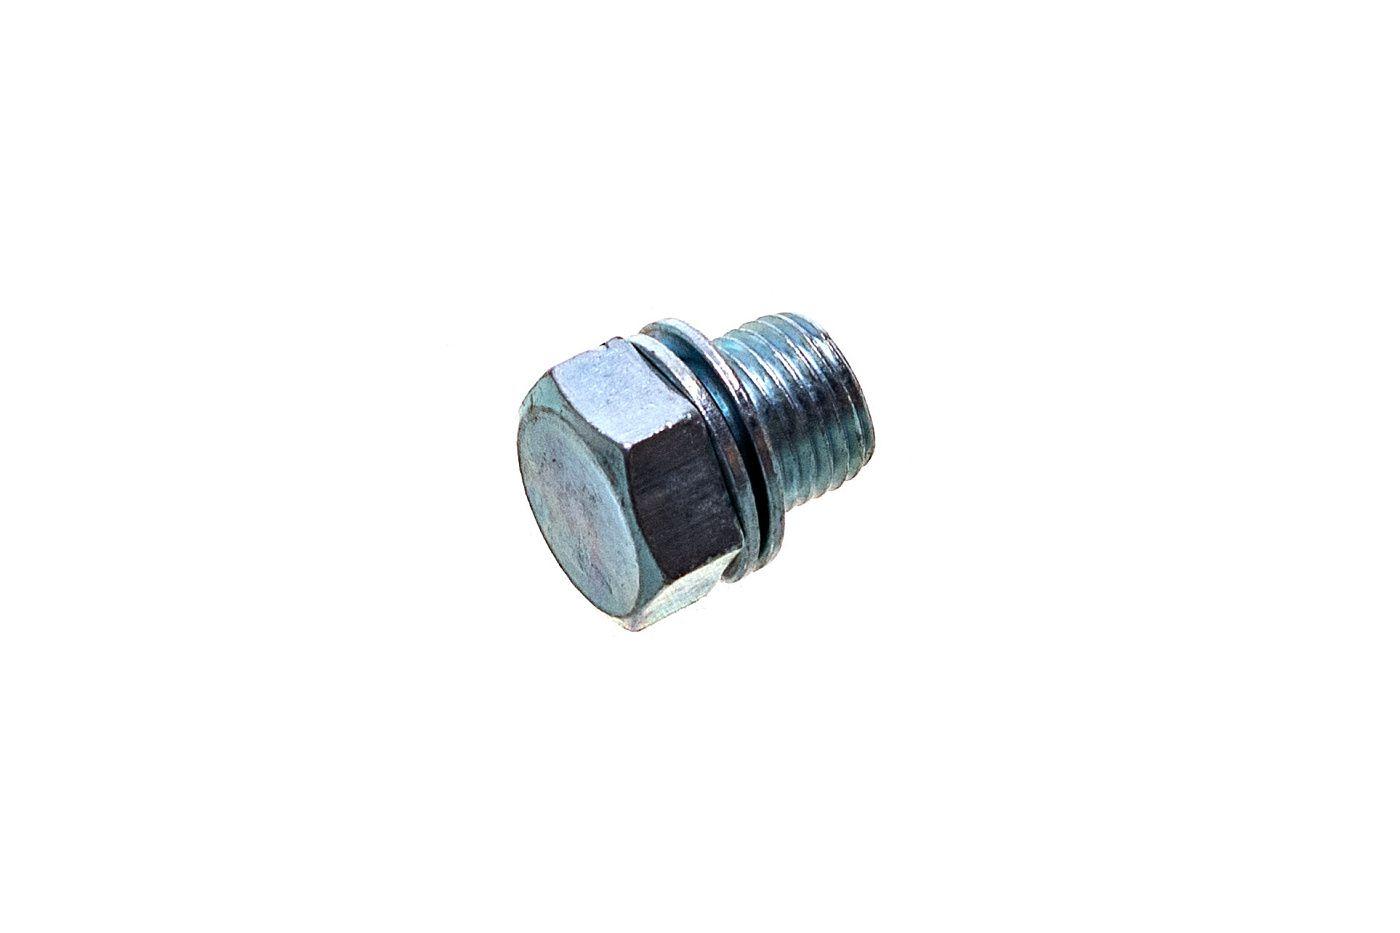 Šroub dekompresního ventilu  M10 x 1,0 - Husqvarna 55 345 346 350, Stihl 361 360 440 362